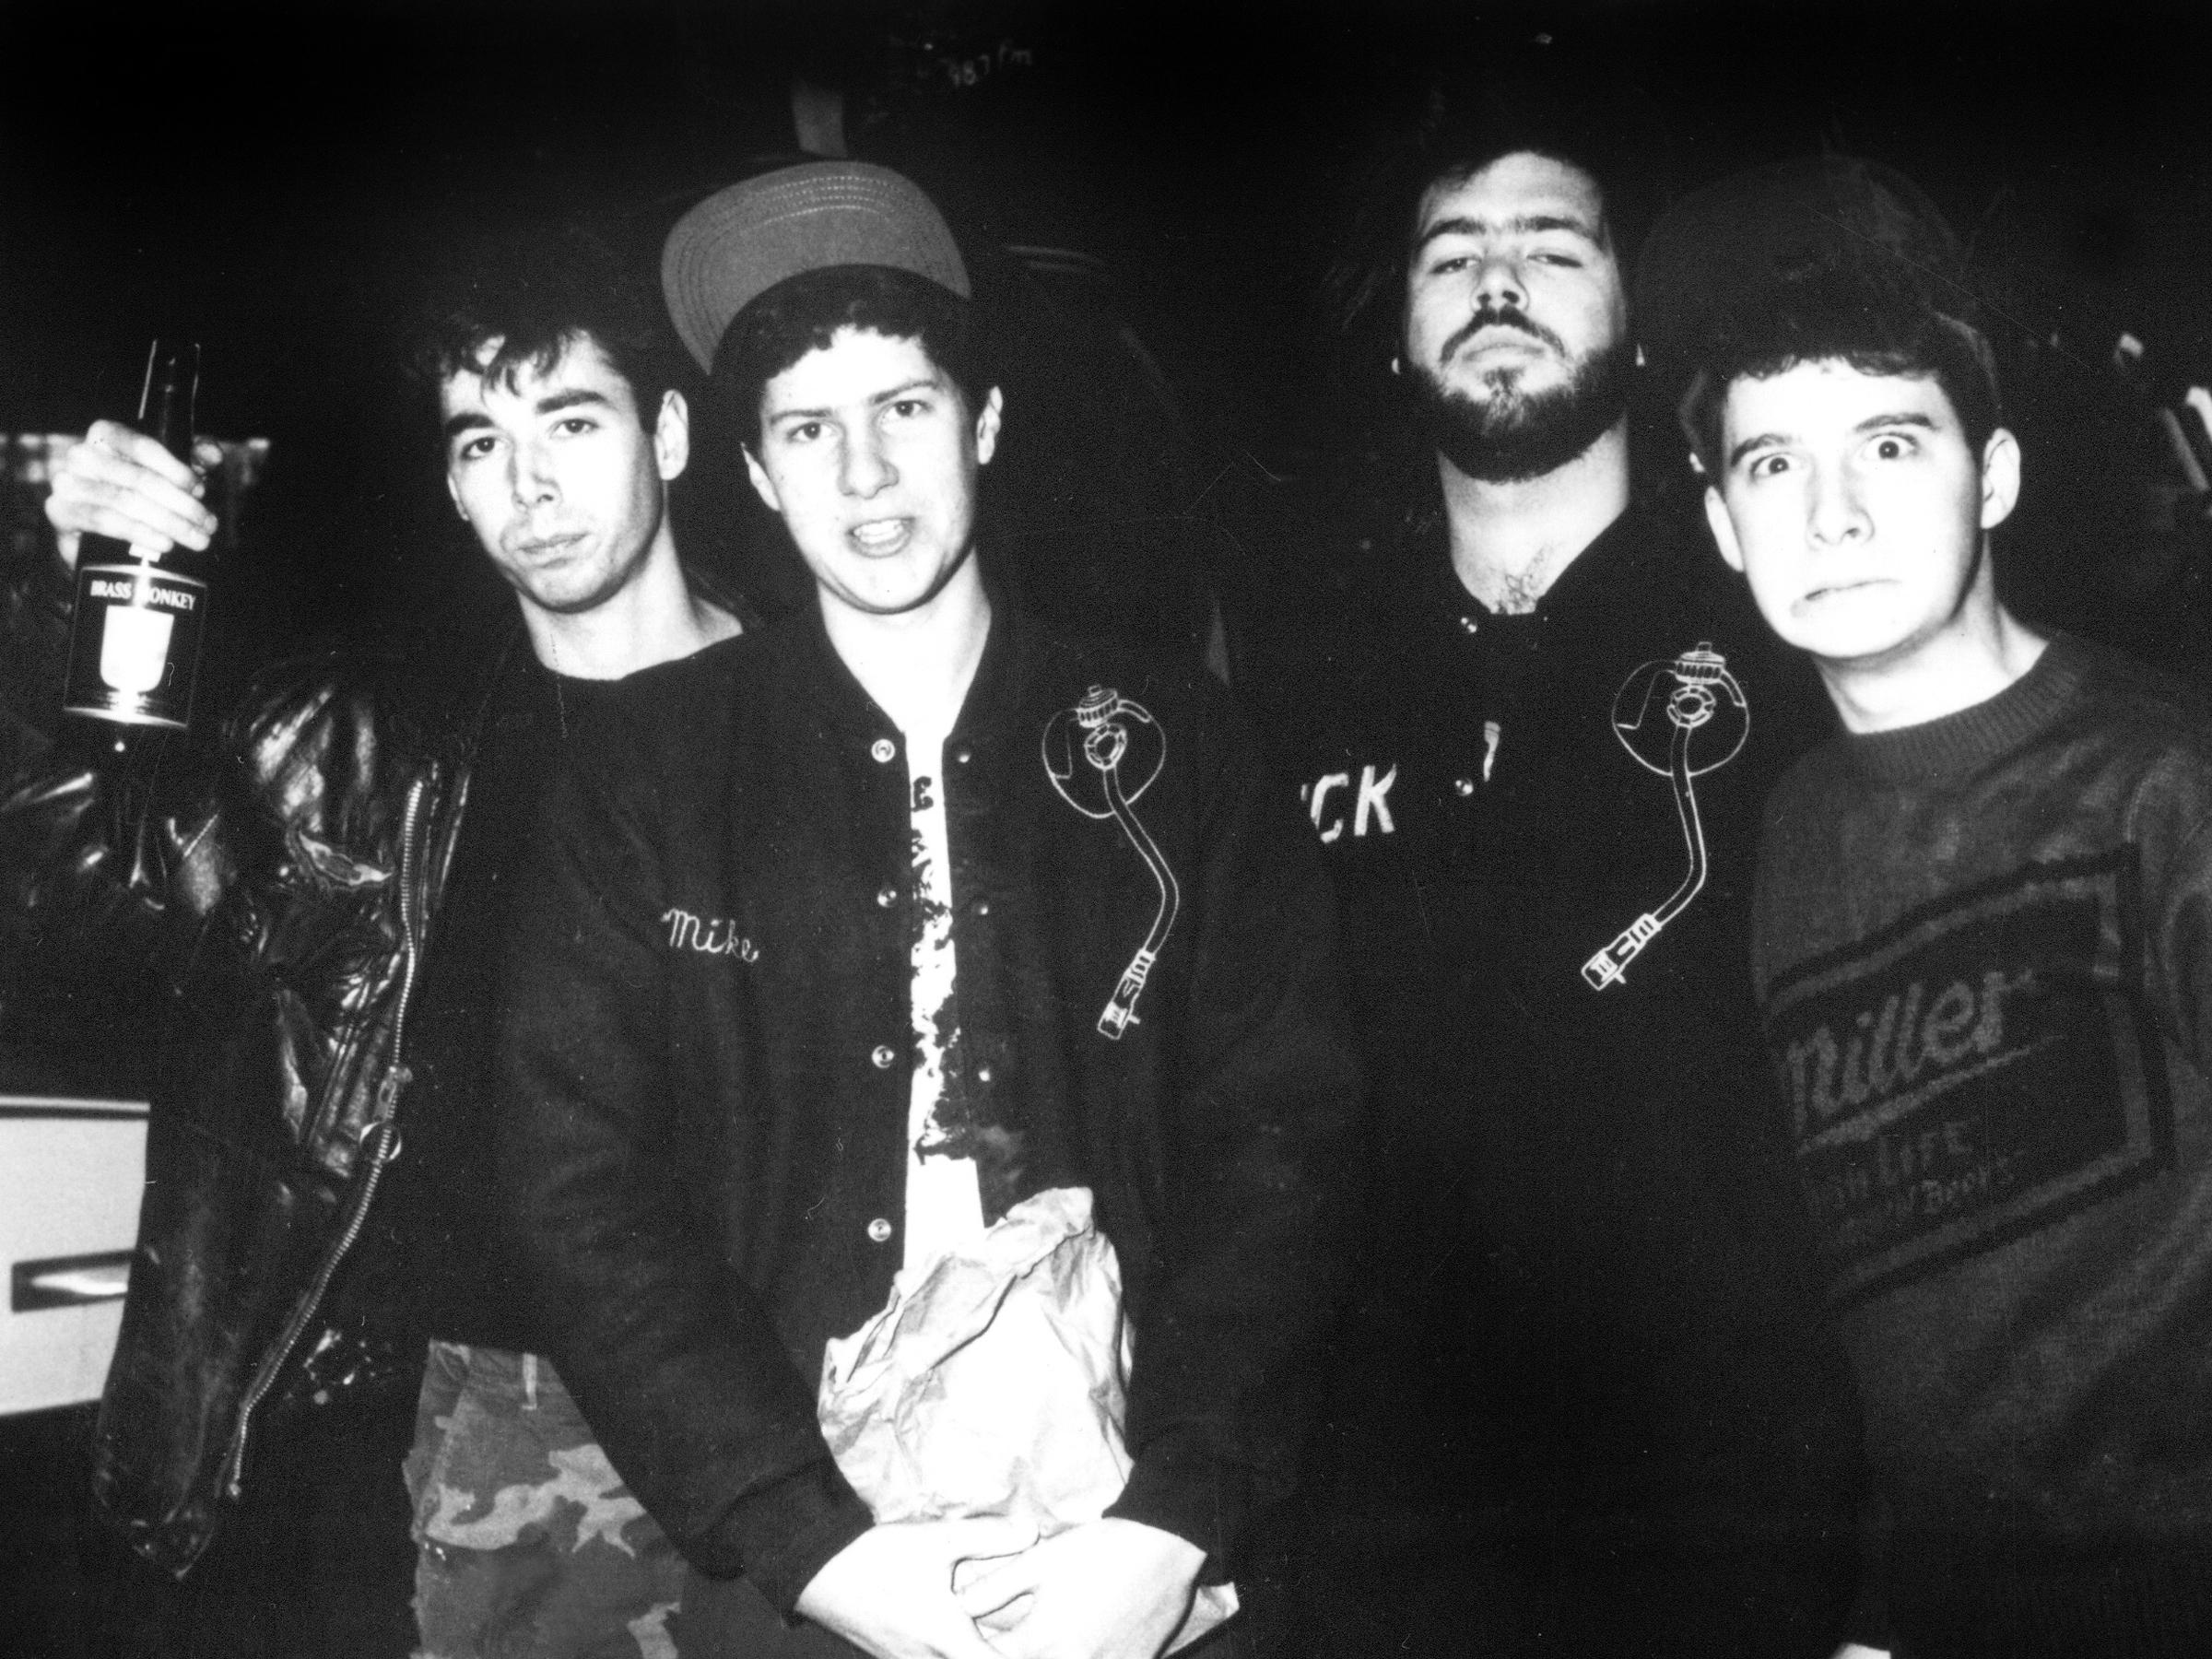 http://cdn.ambrosiaforheads.com/wp-content/uploads/2014/09/beastie-boys-rick-rubin-1985.jpg